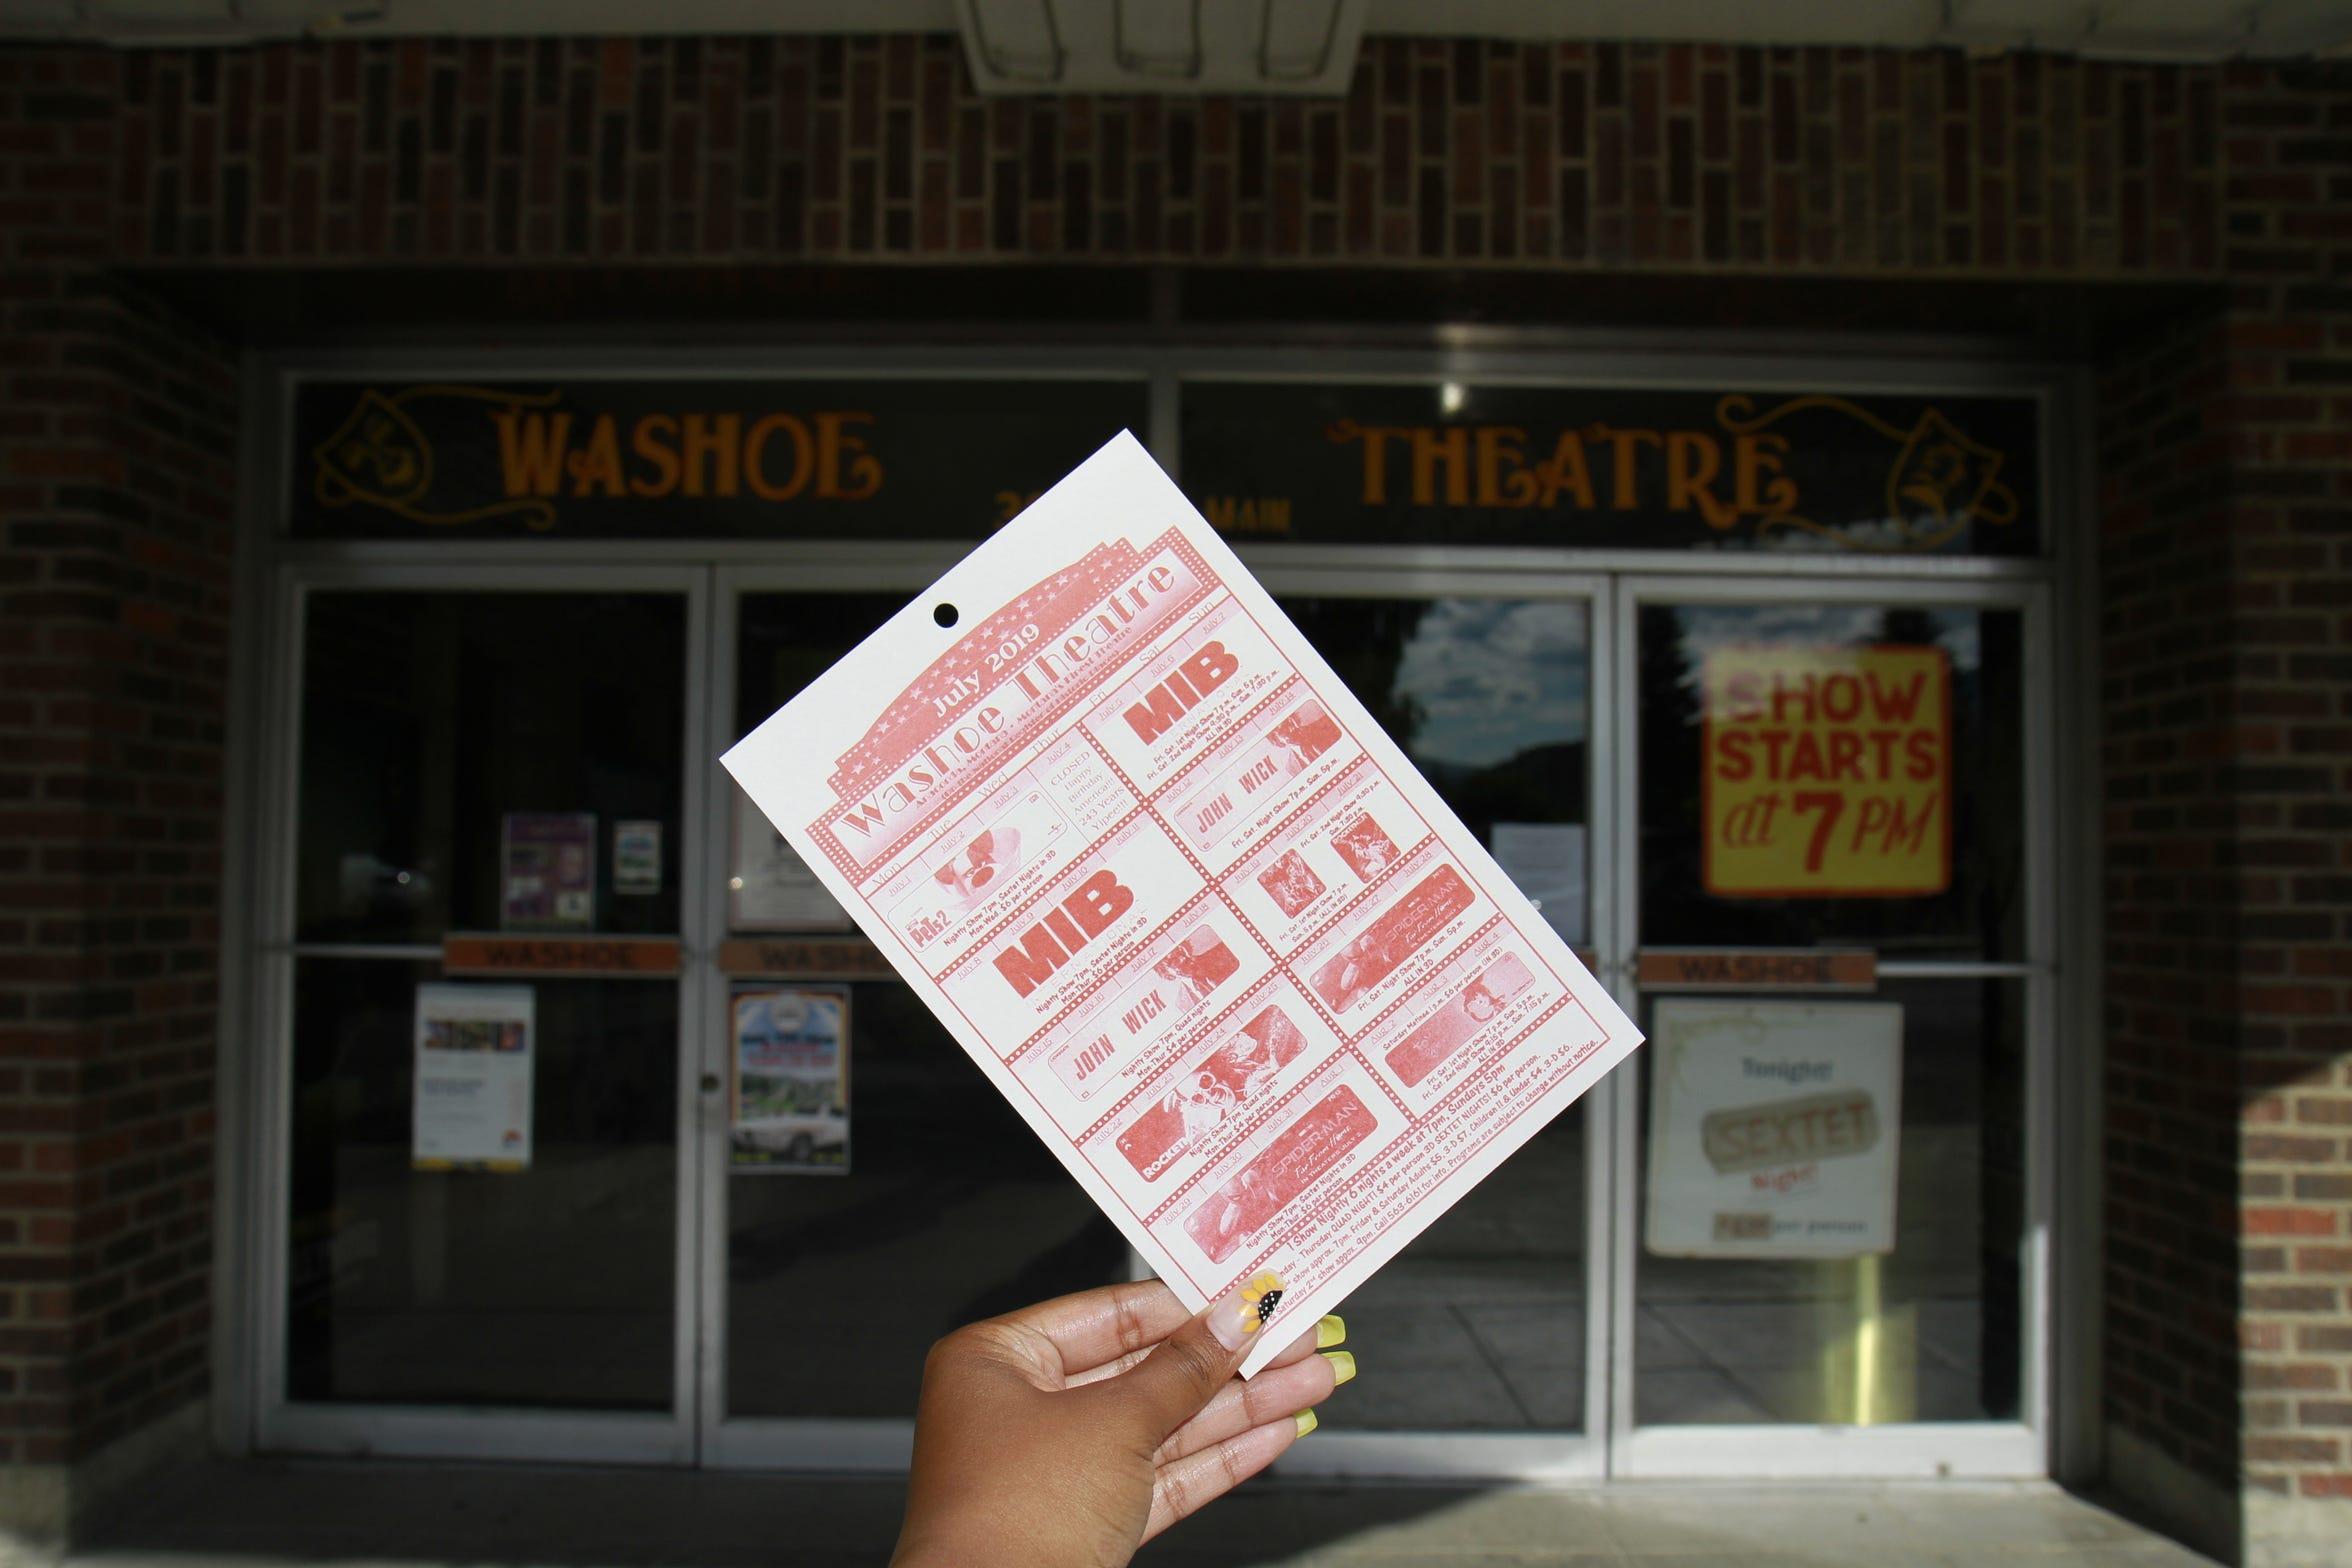 The Washoe Theatre